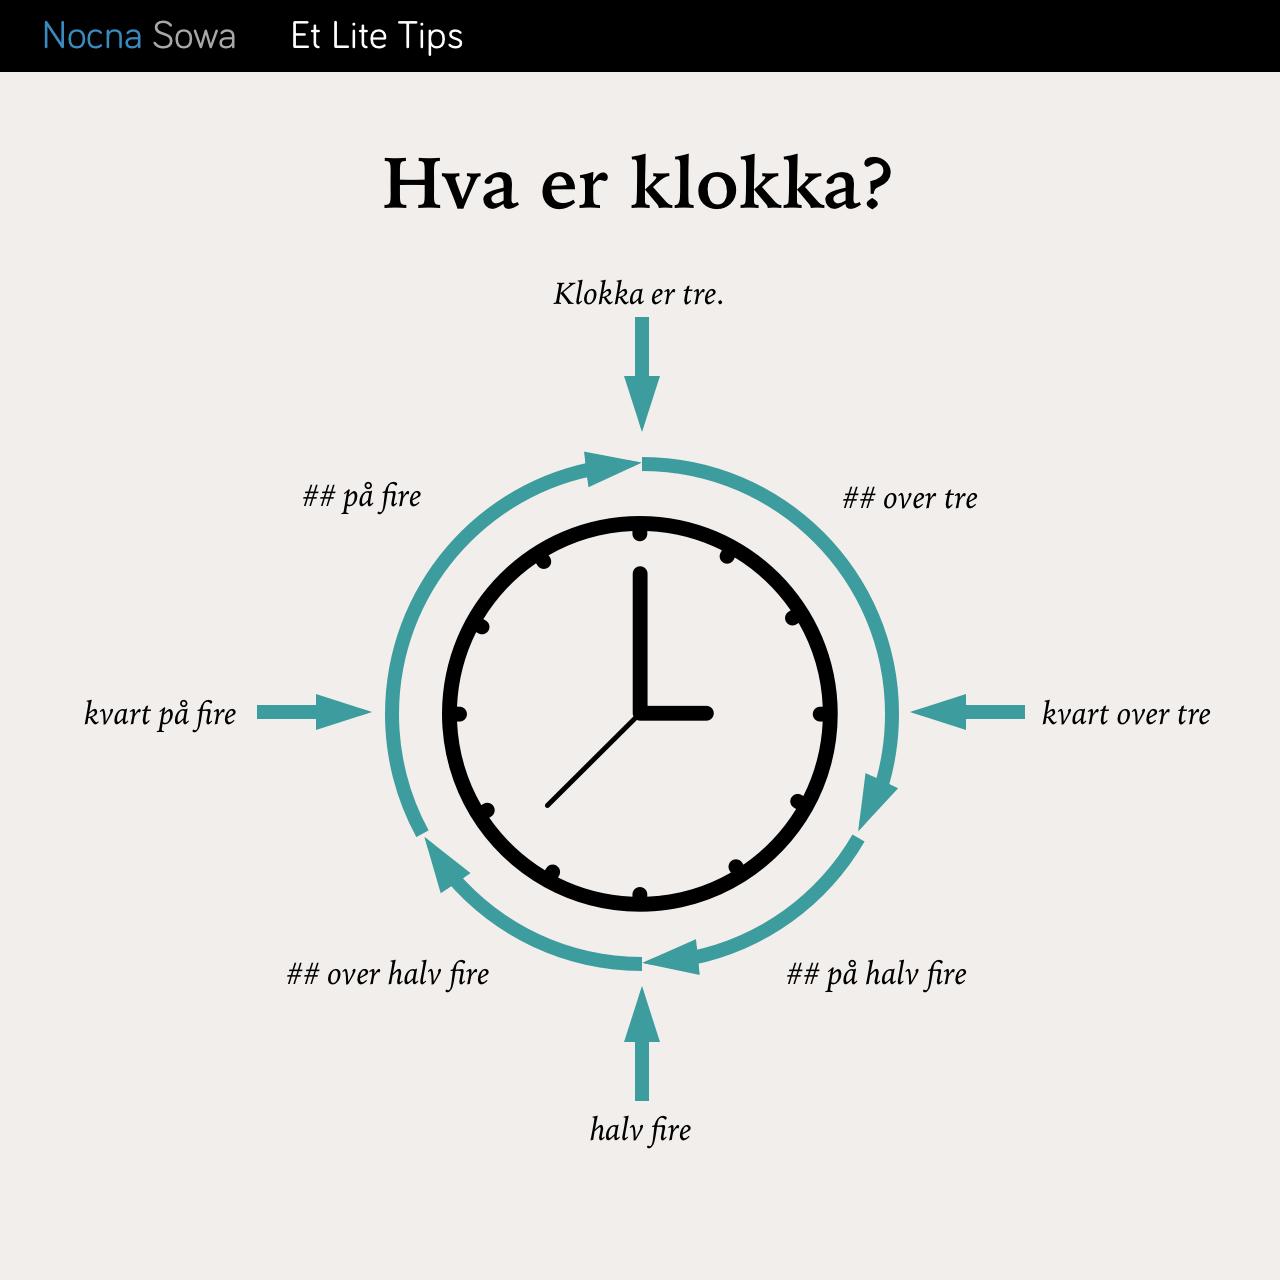 Godziny po norwesku